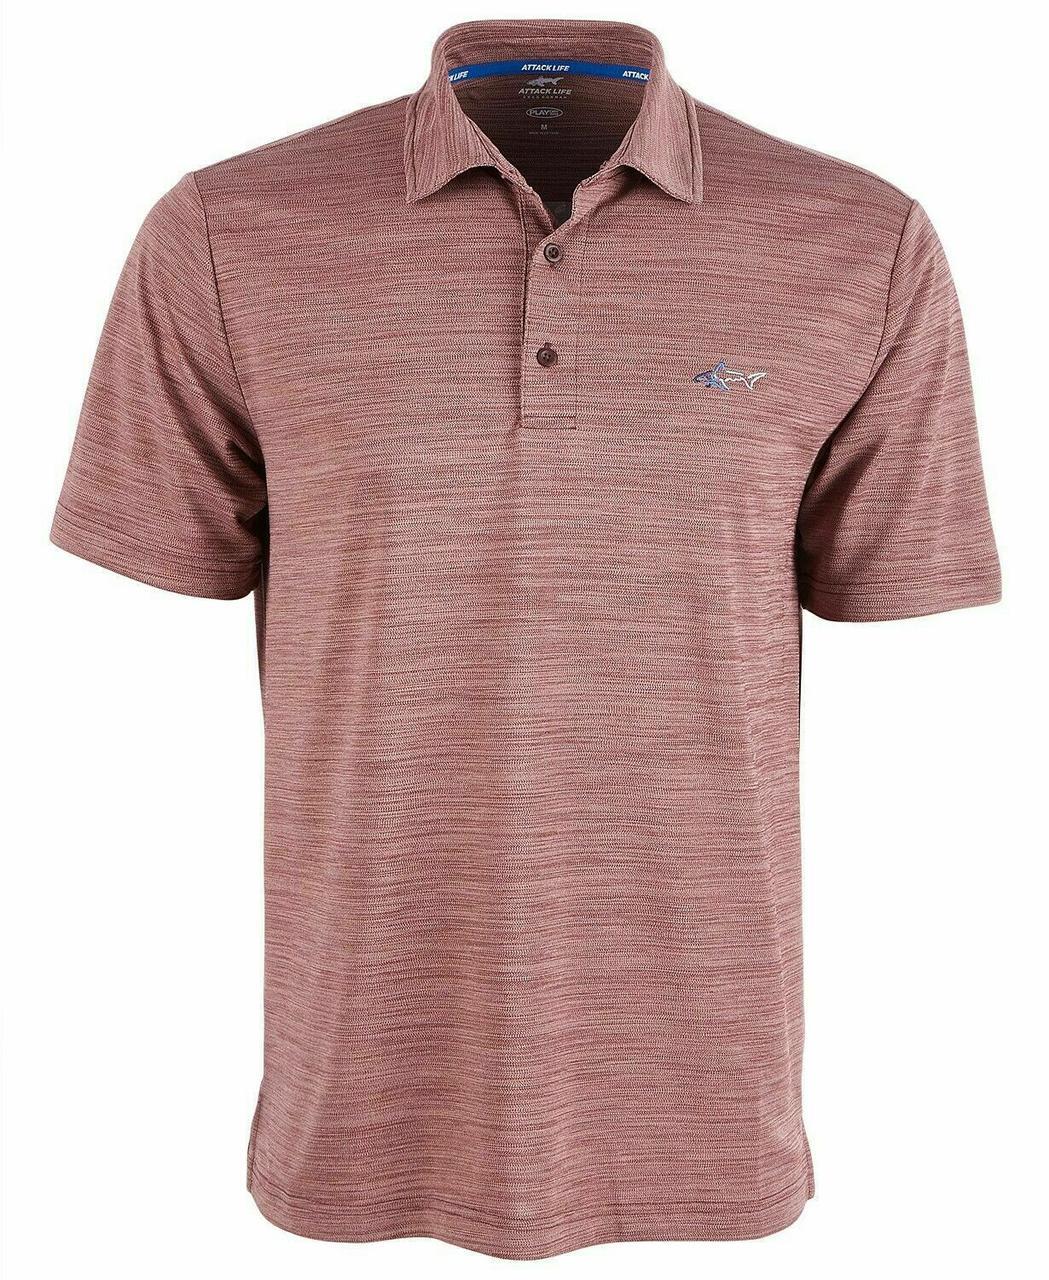 Greg Norman Мужская футболка поло  2000000348773